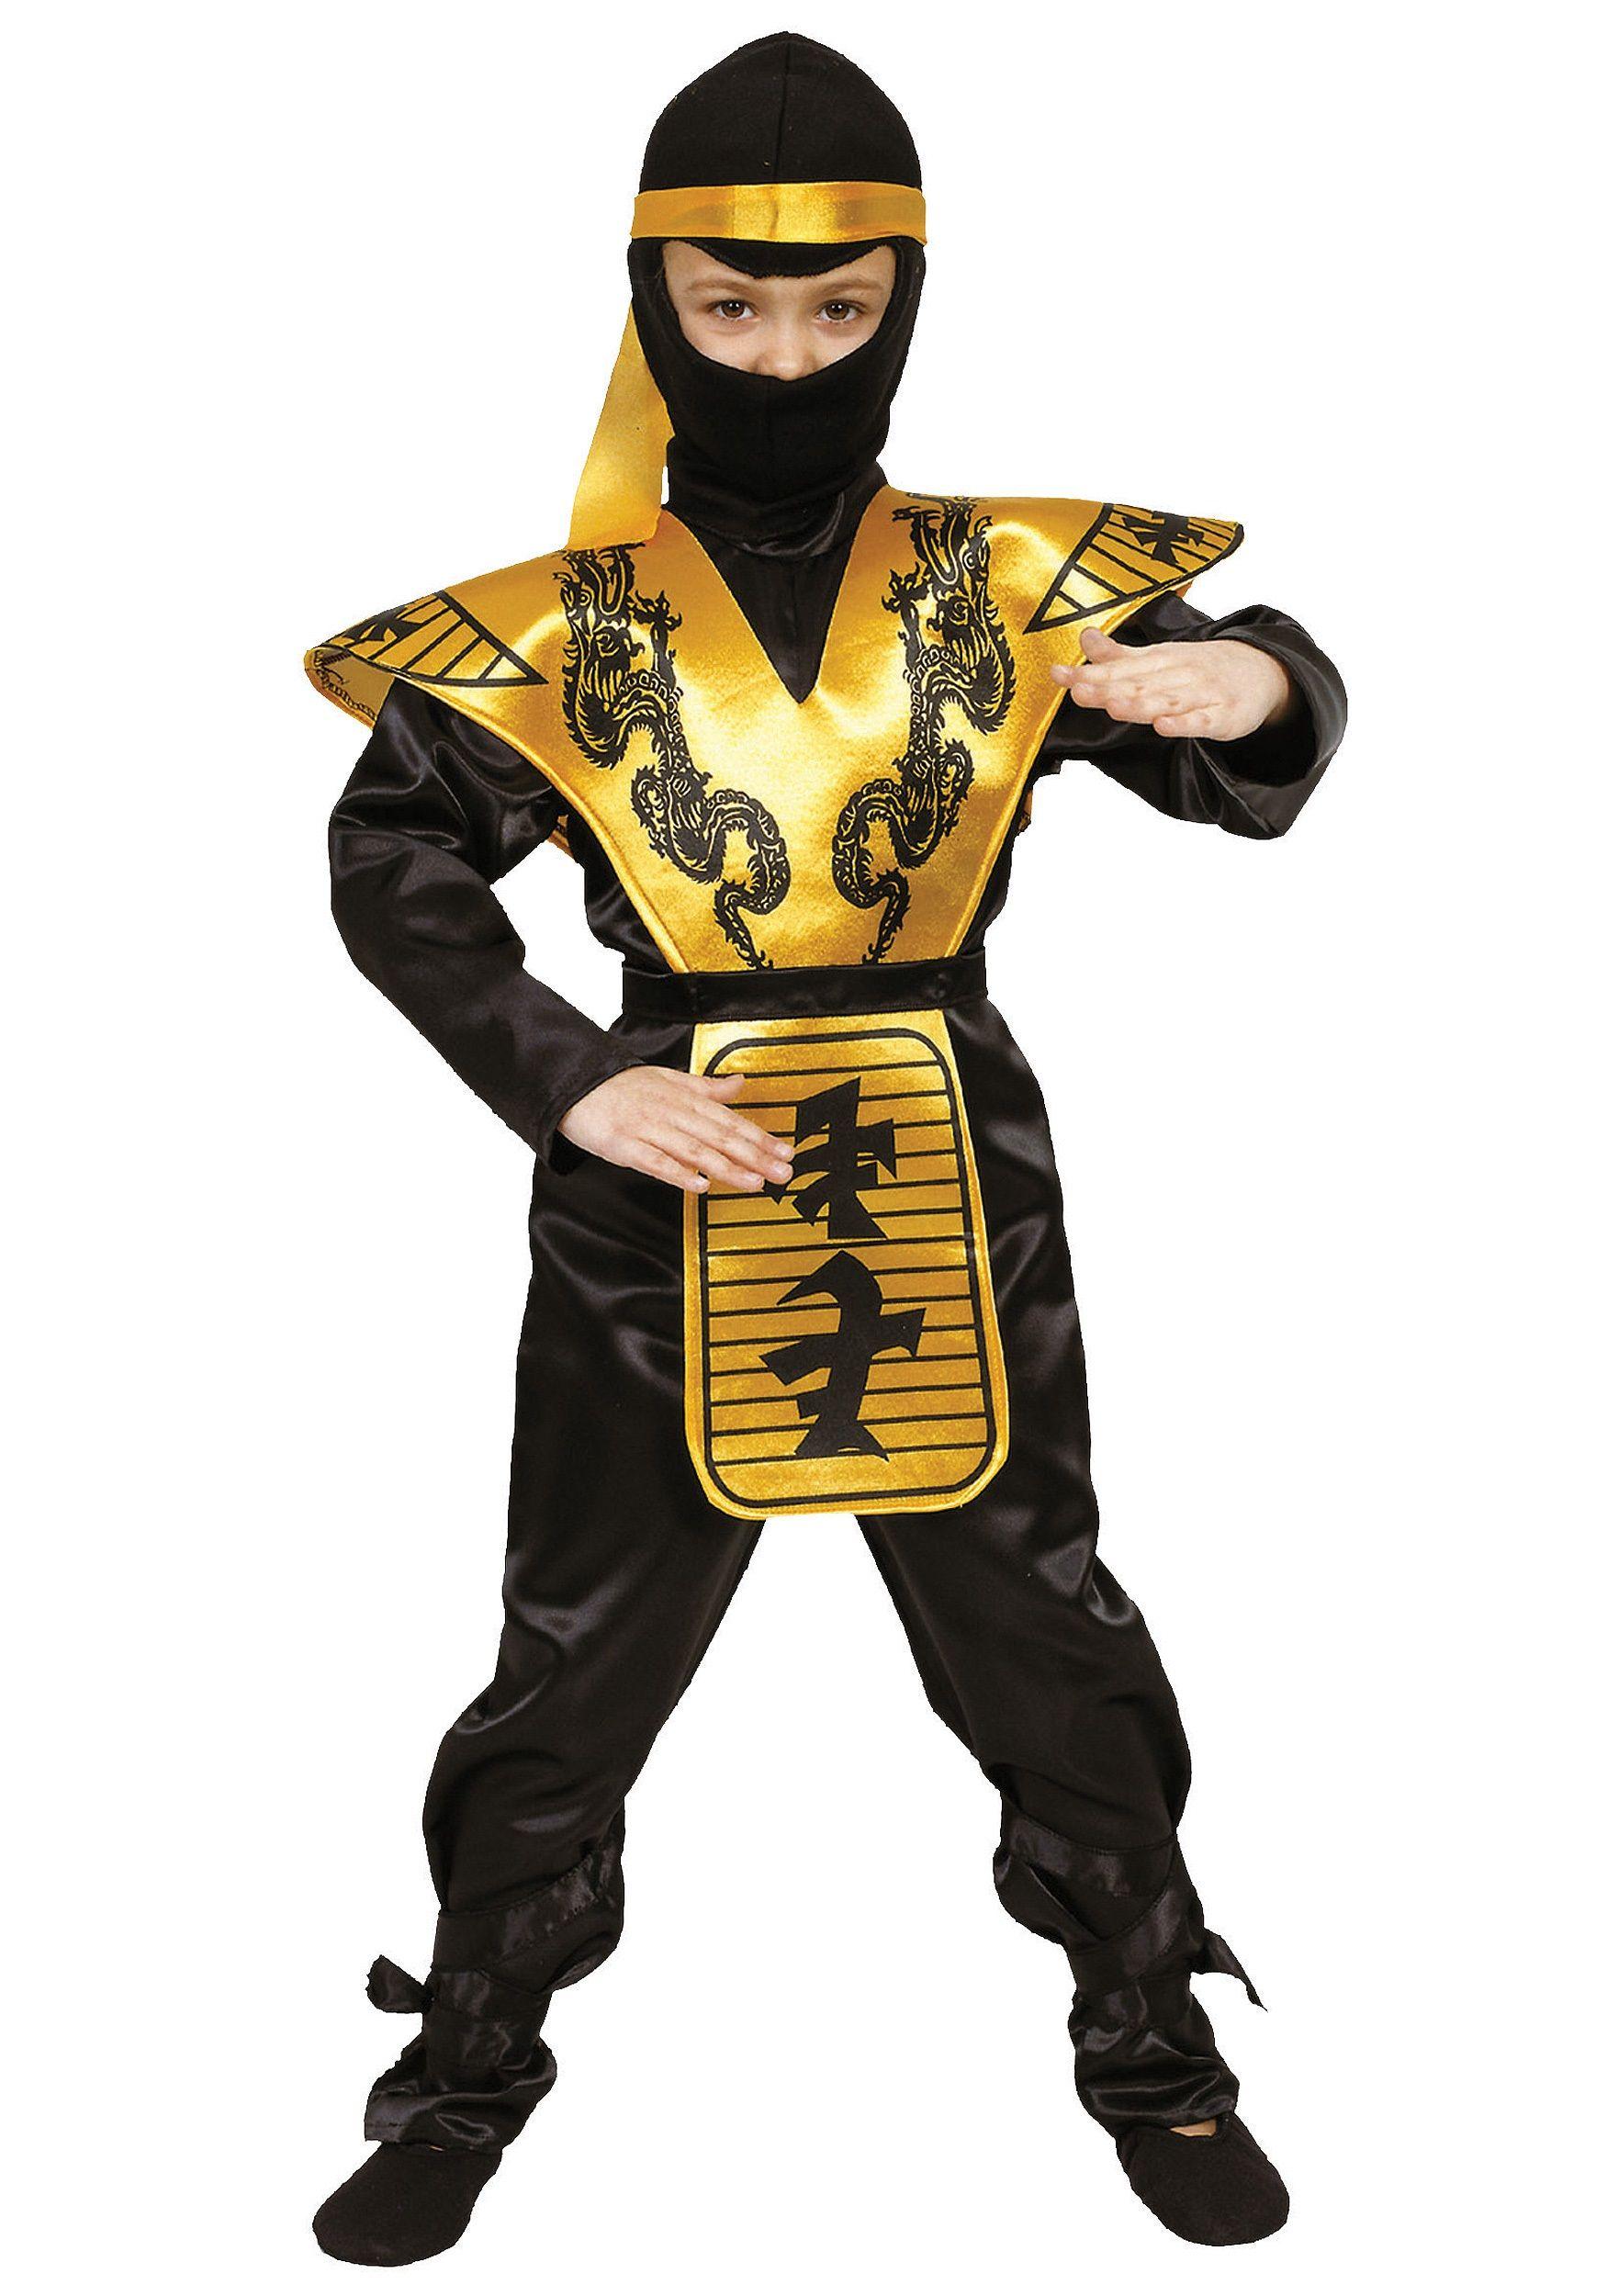 Looks - Costumes Halloween boys ninja pictures video